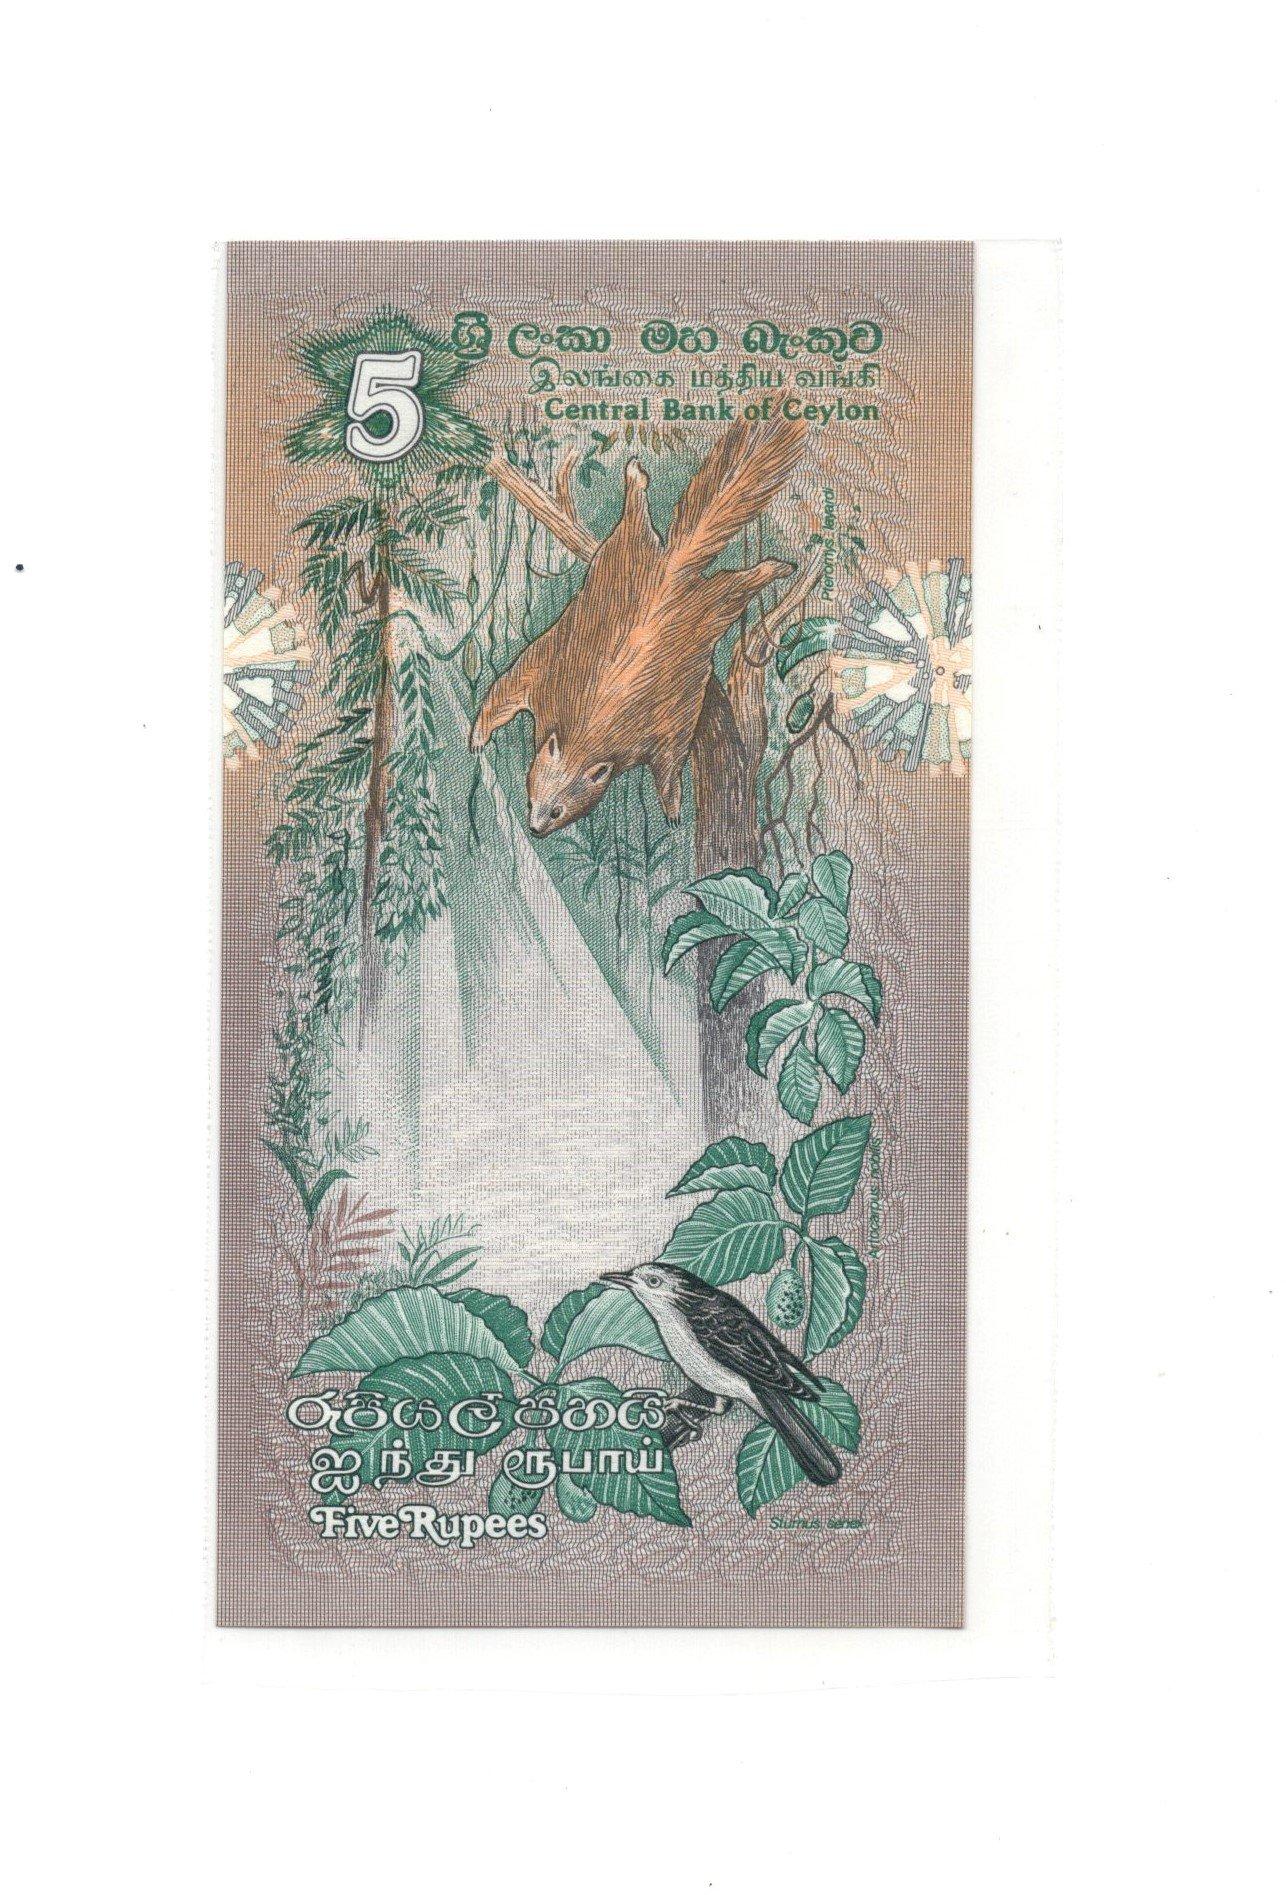 ceylon 5 rupees 1979